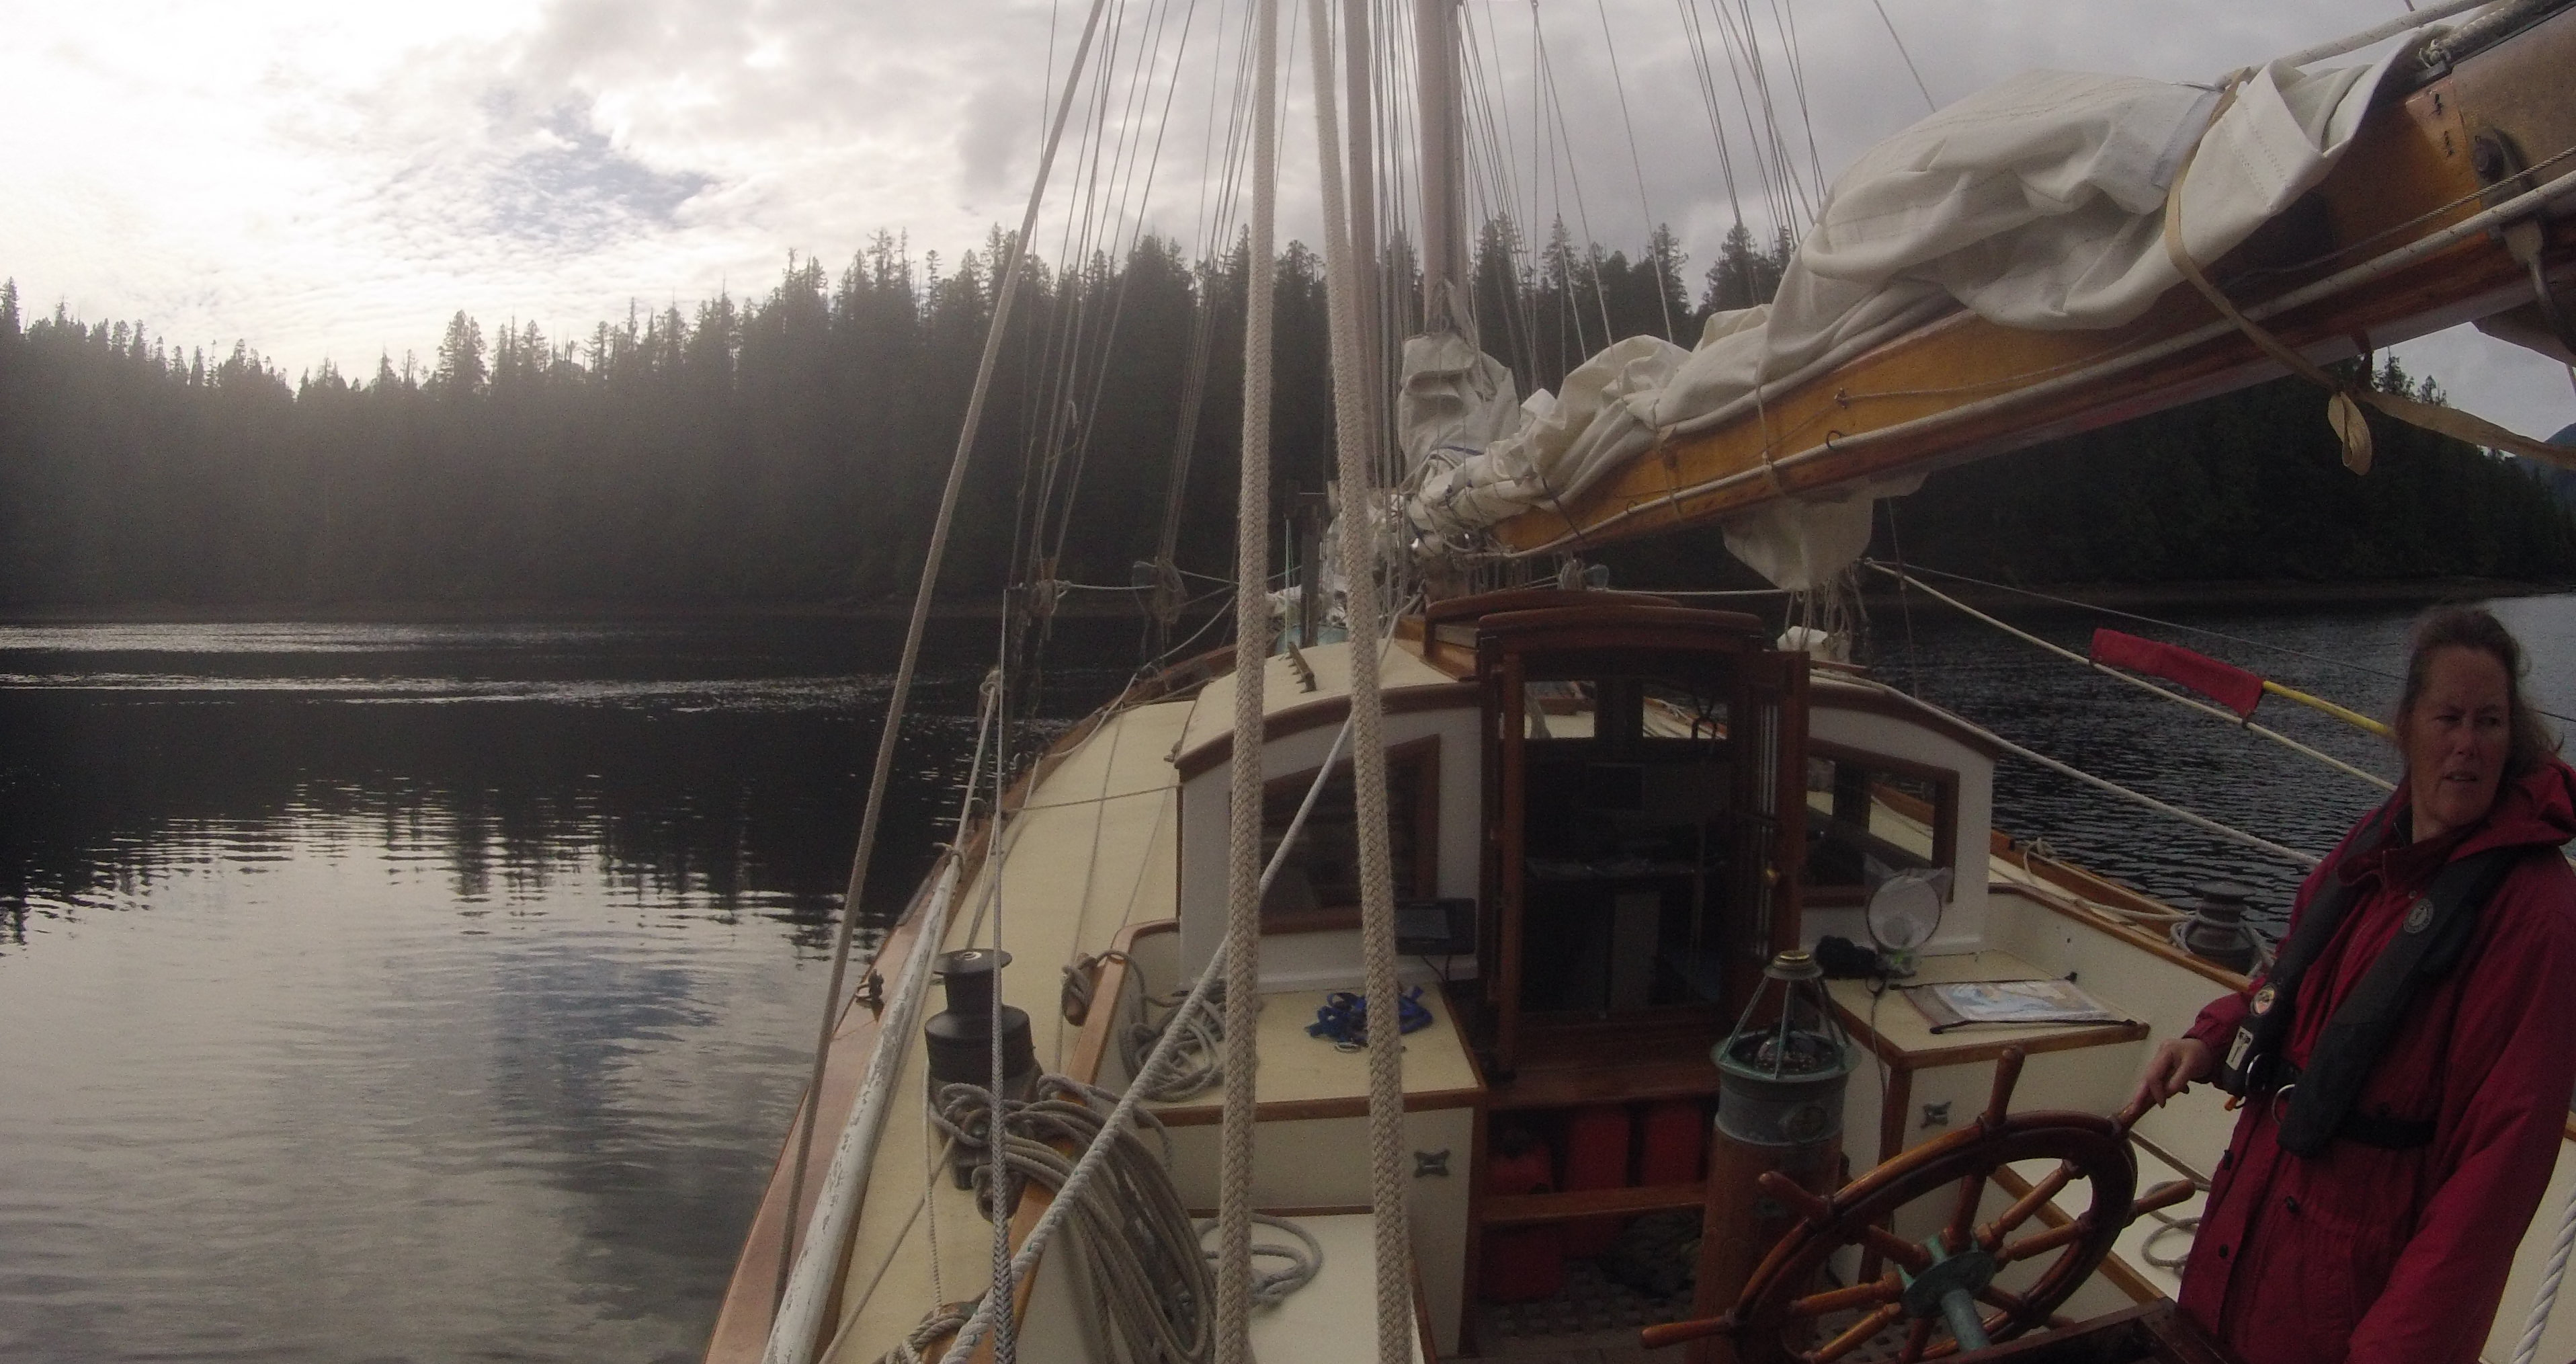 Anchoring backing down